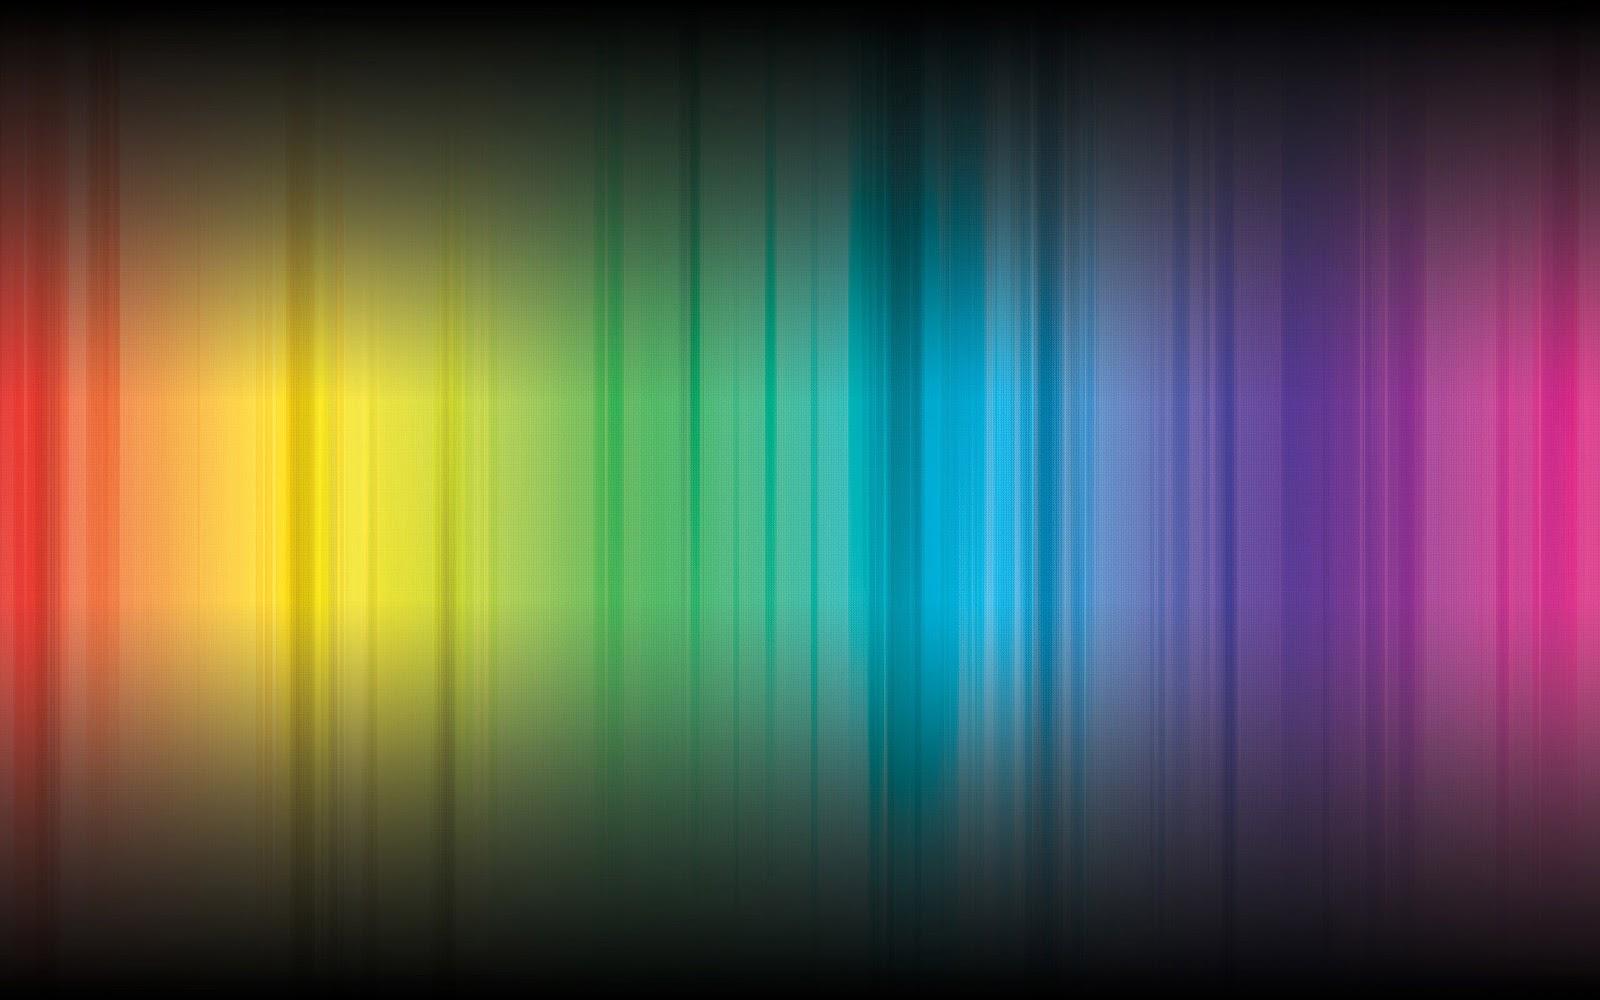 spectrum of light background - photo #32